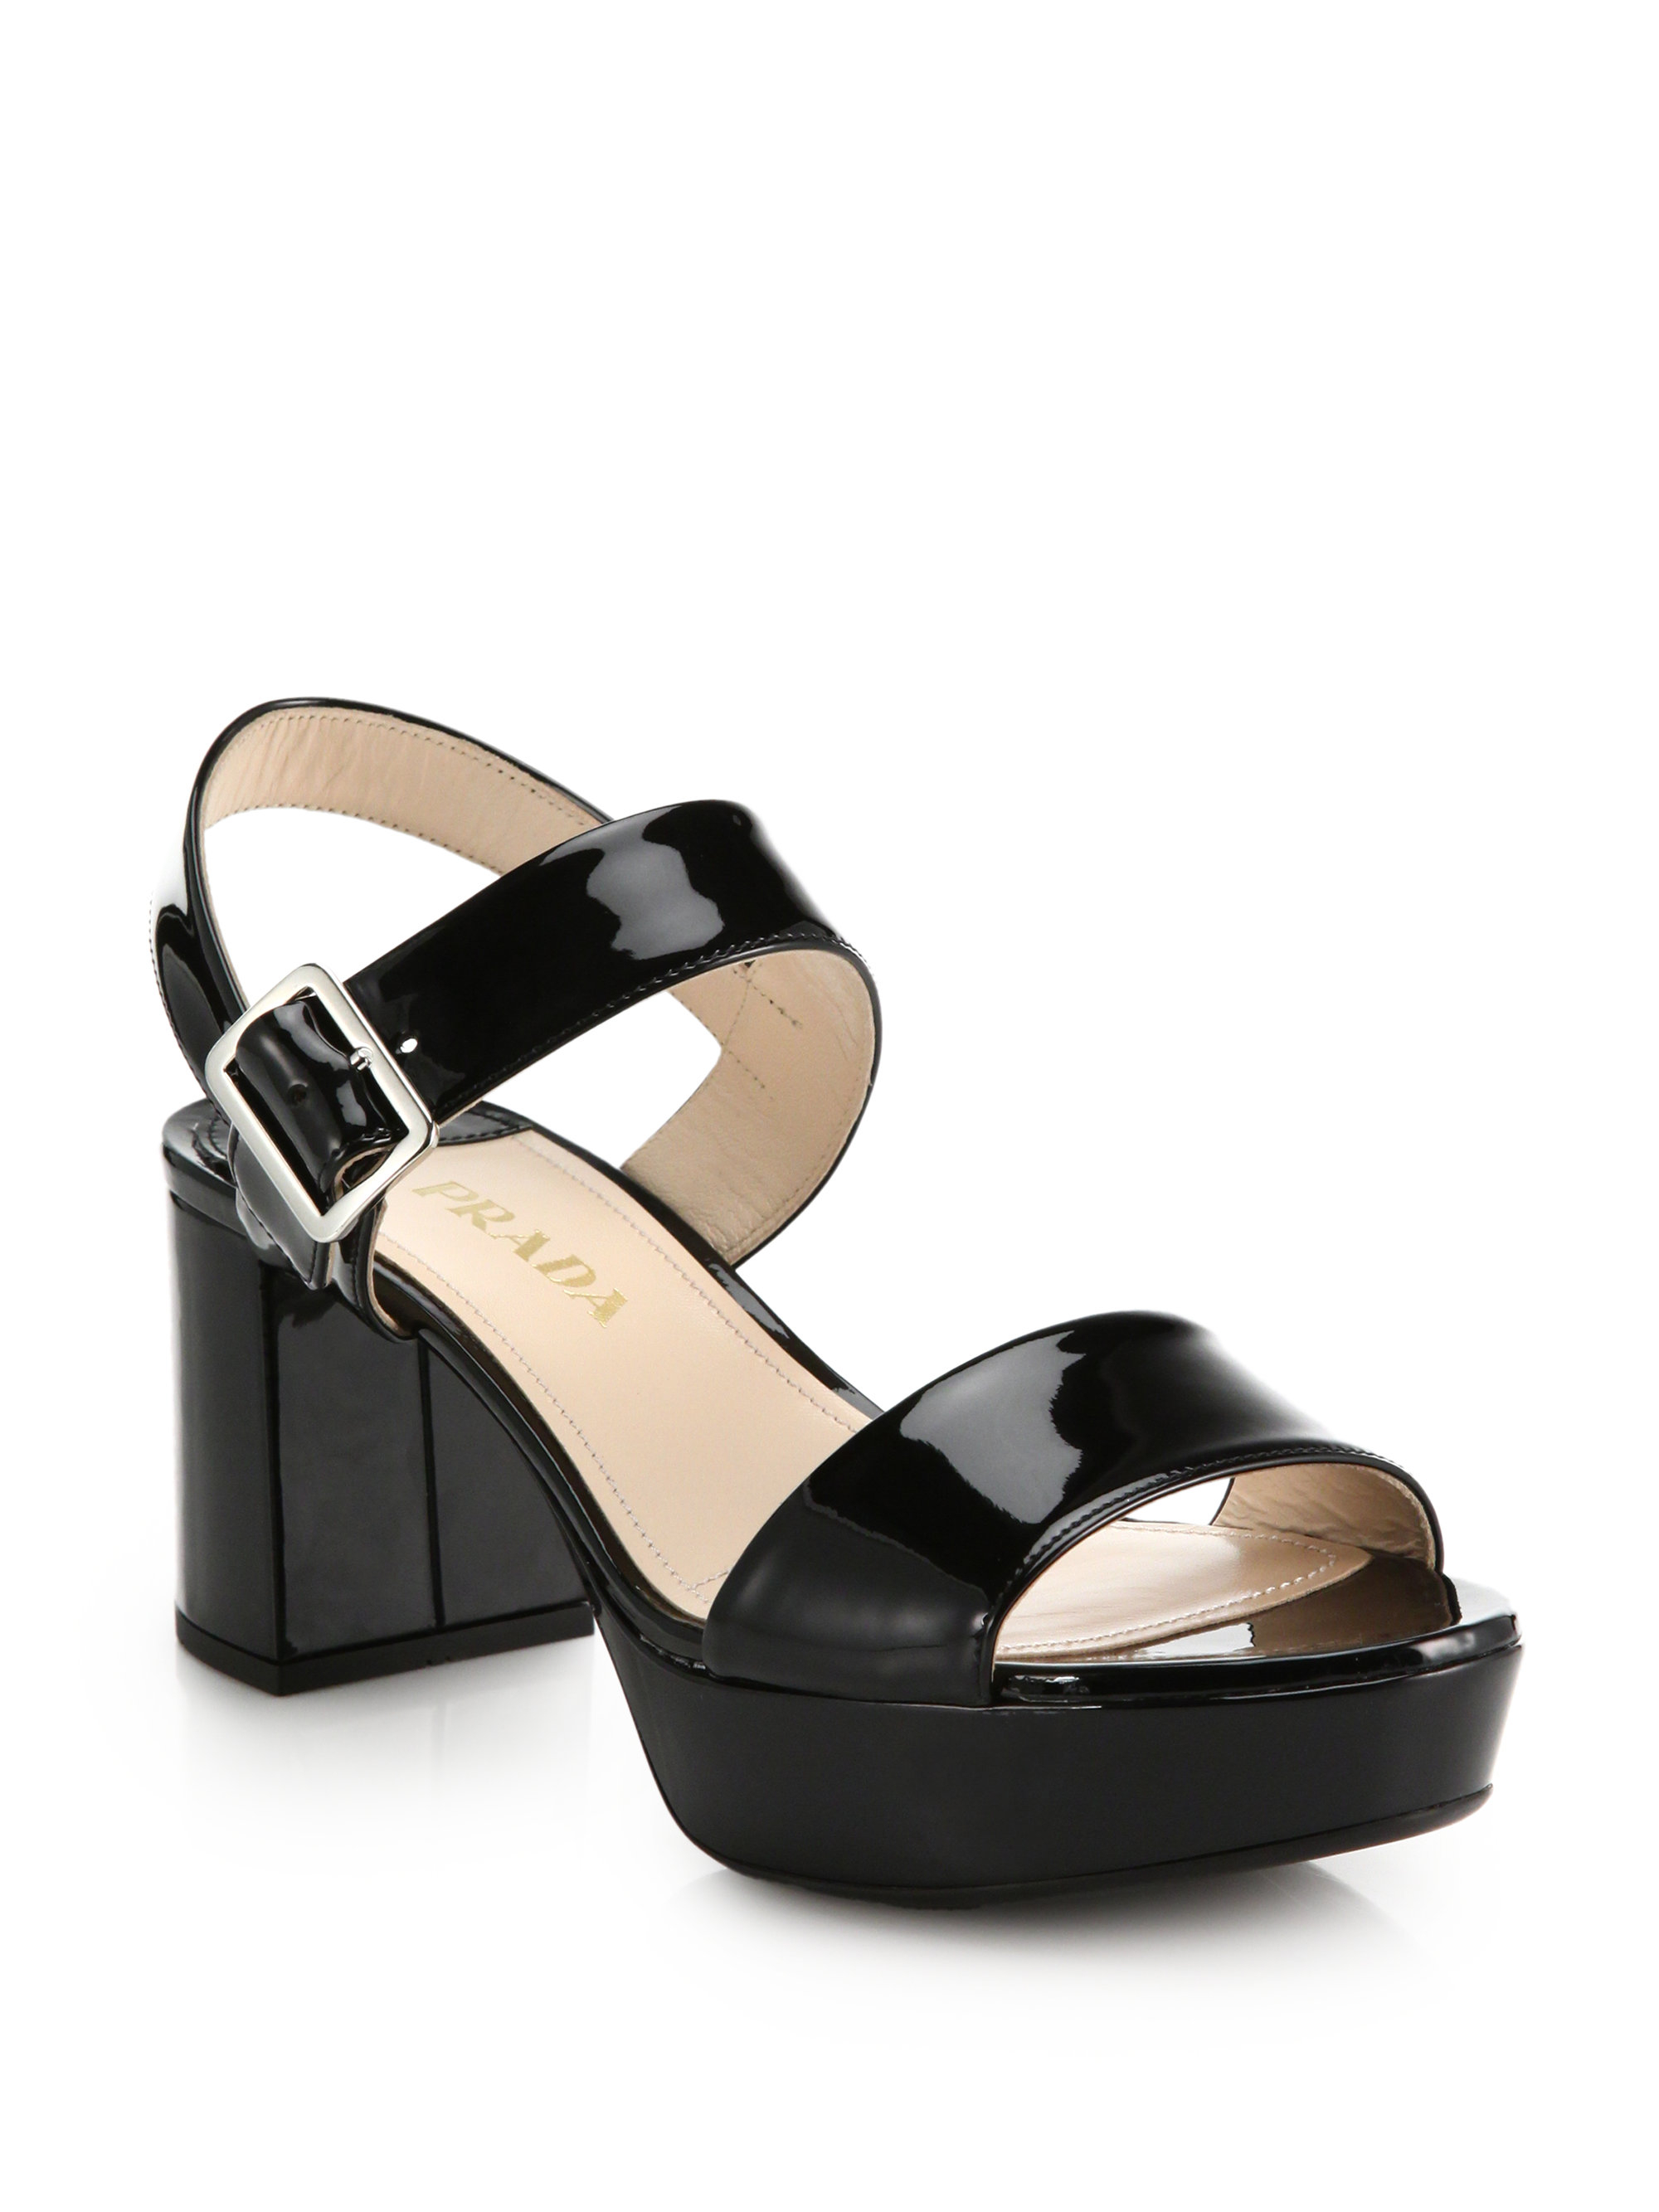 654c5e892cf Lyst - Prada Patent Leather Sandals in Black